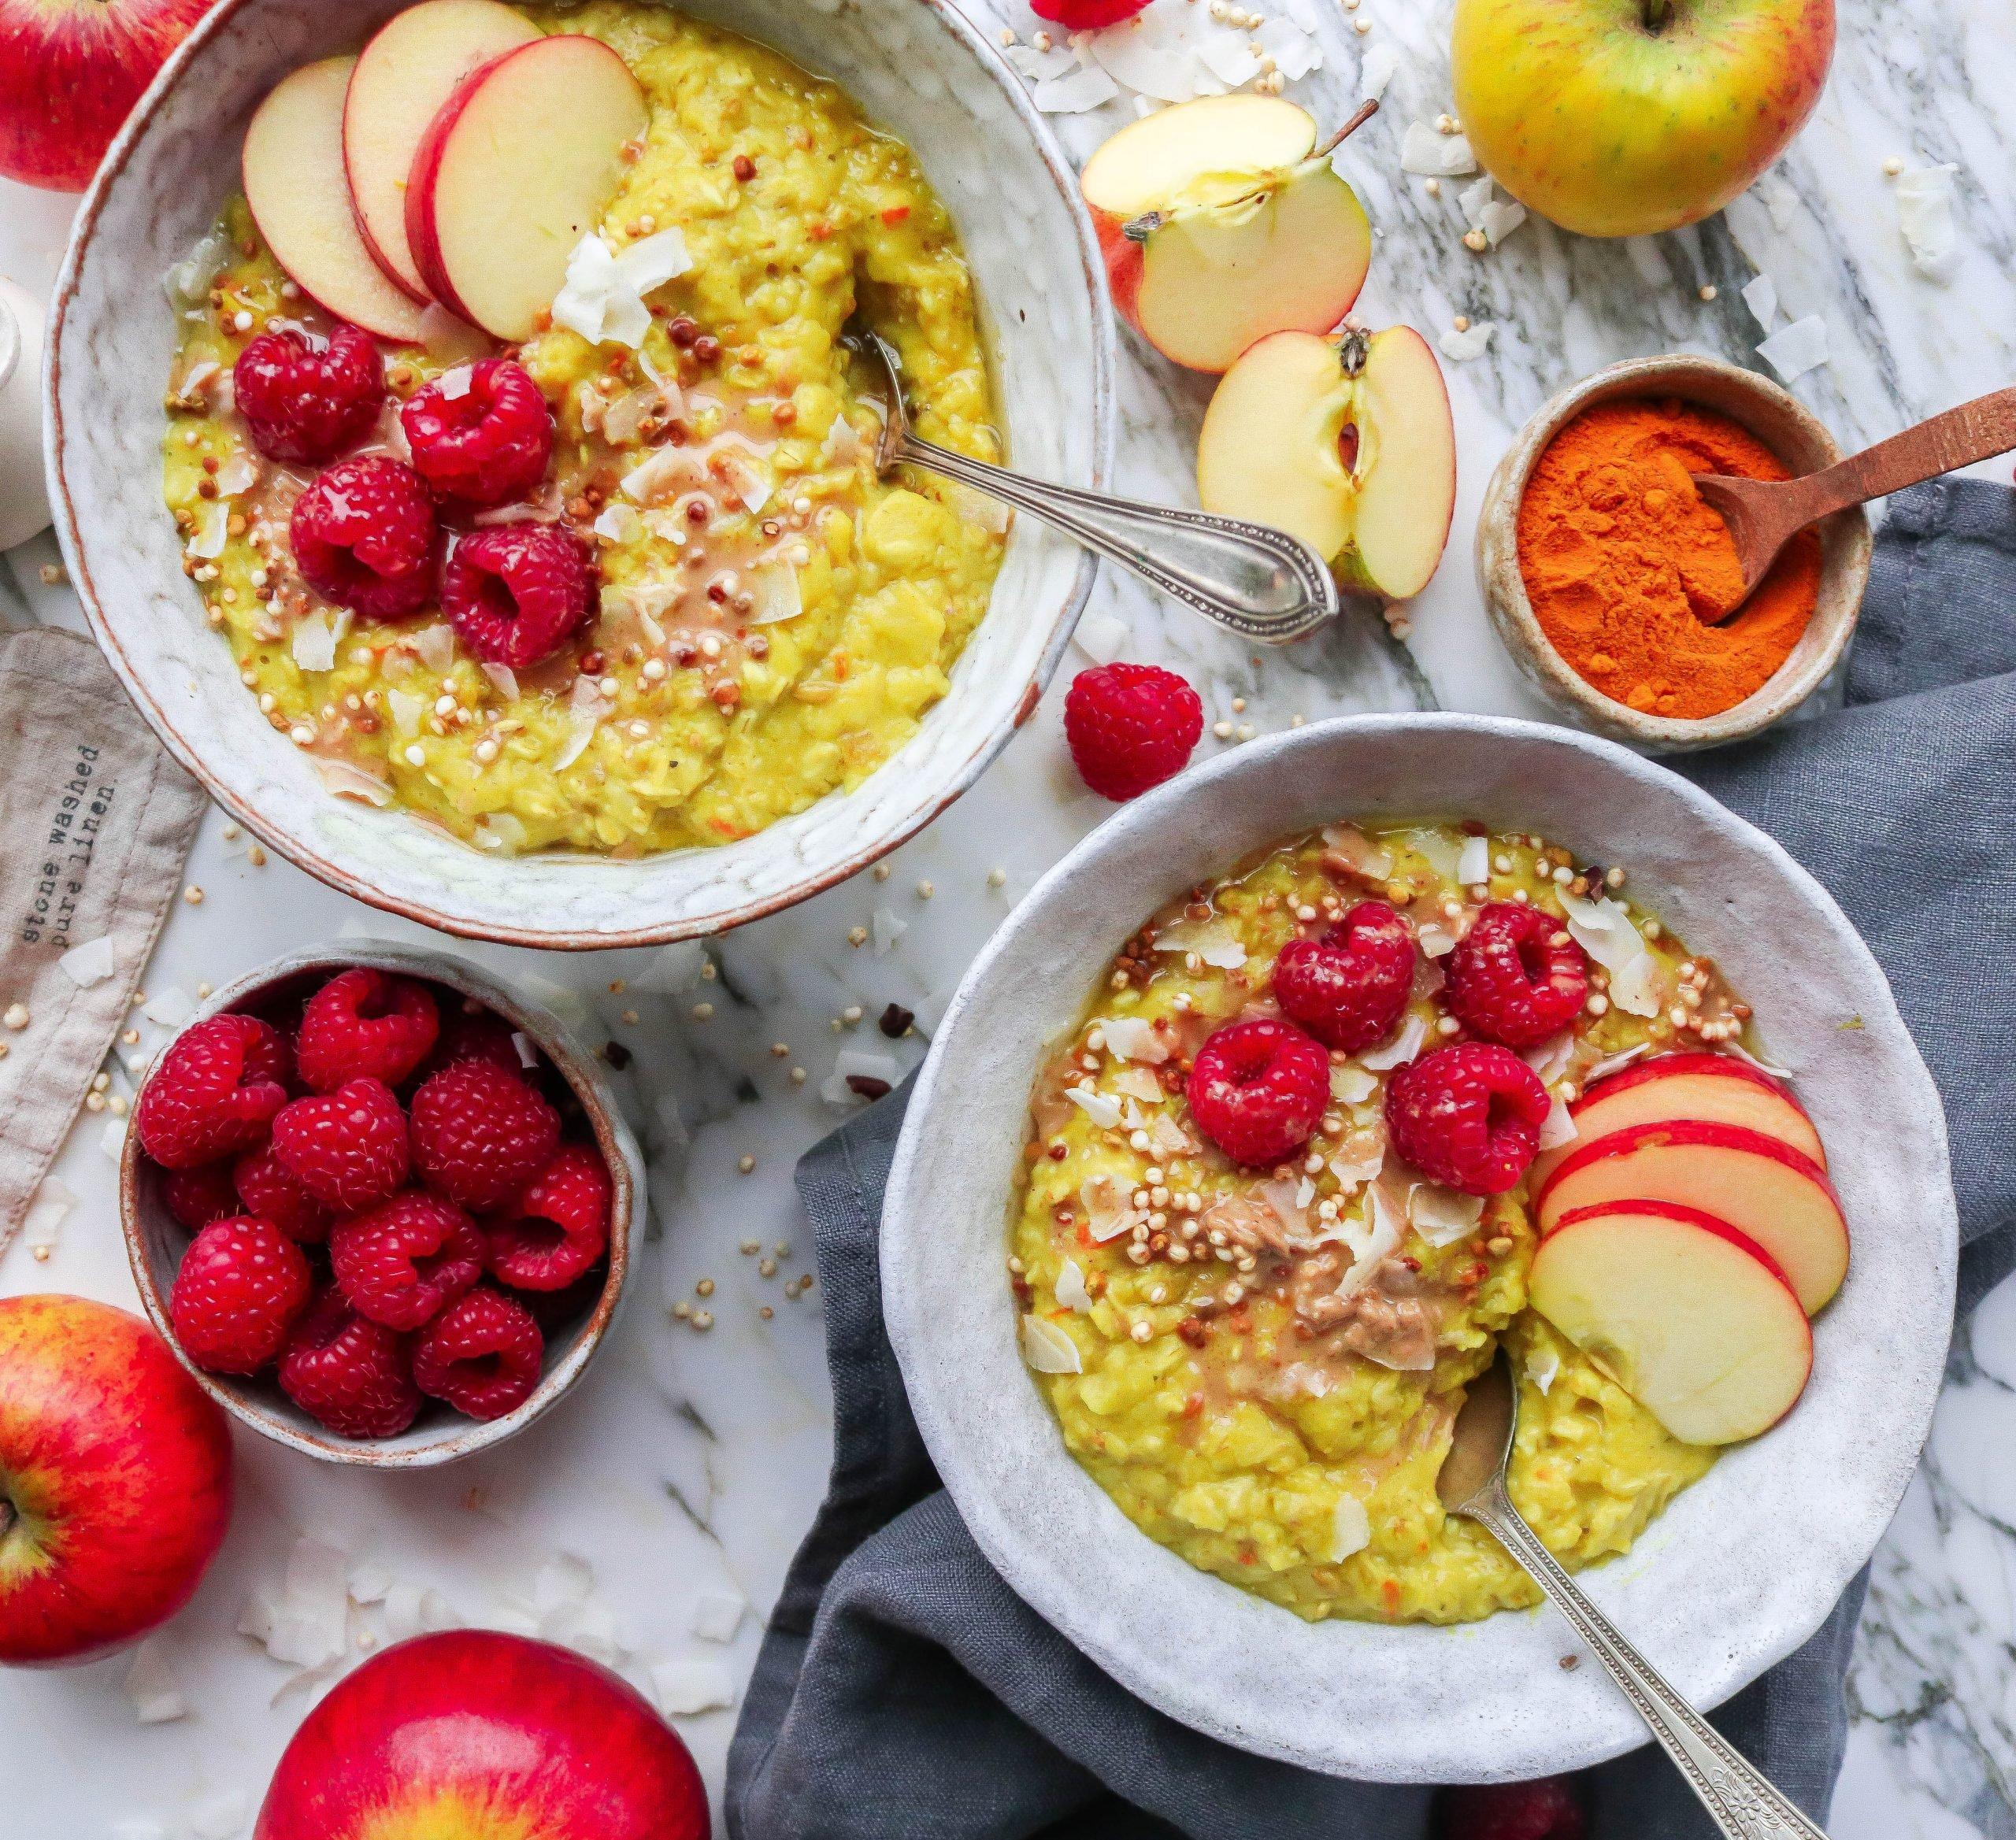 Turmeric & Apple Porridge